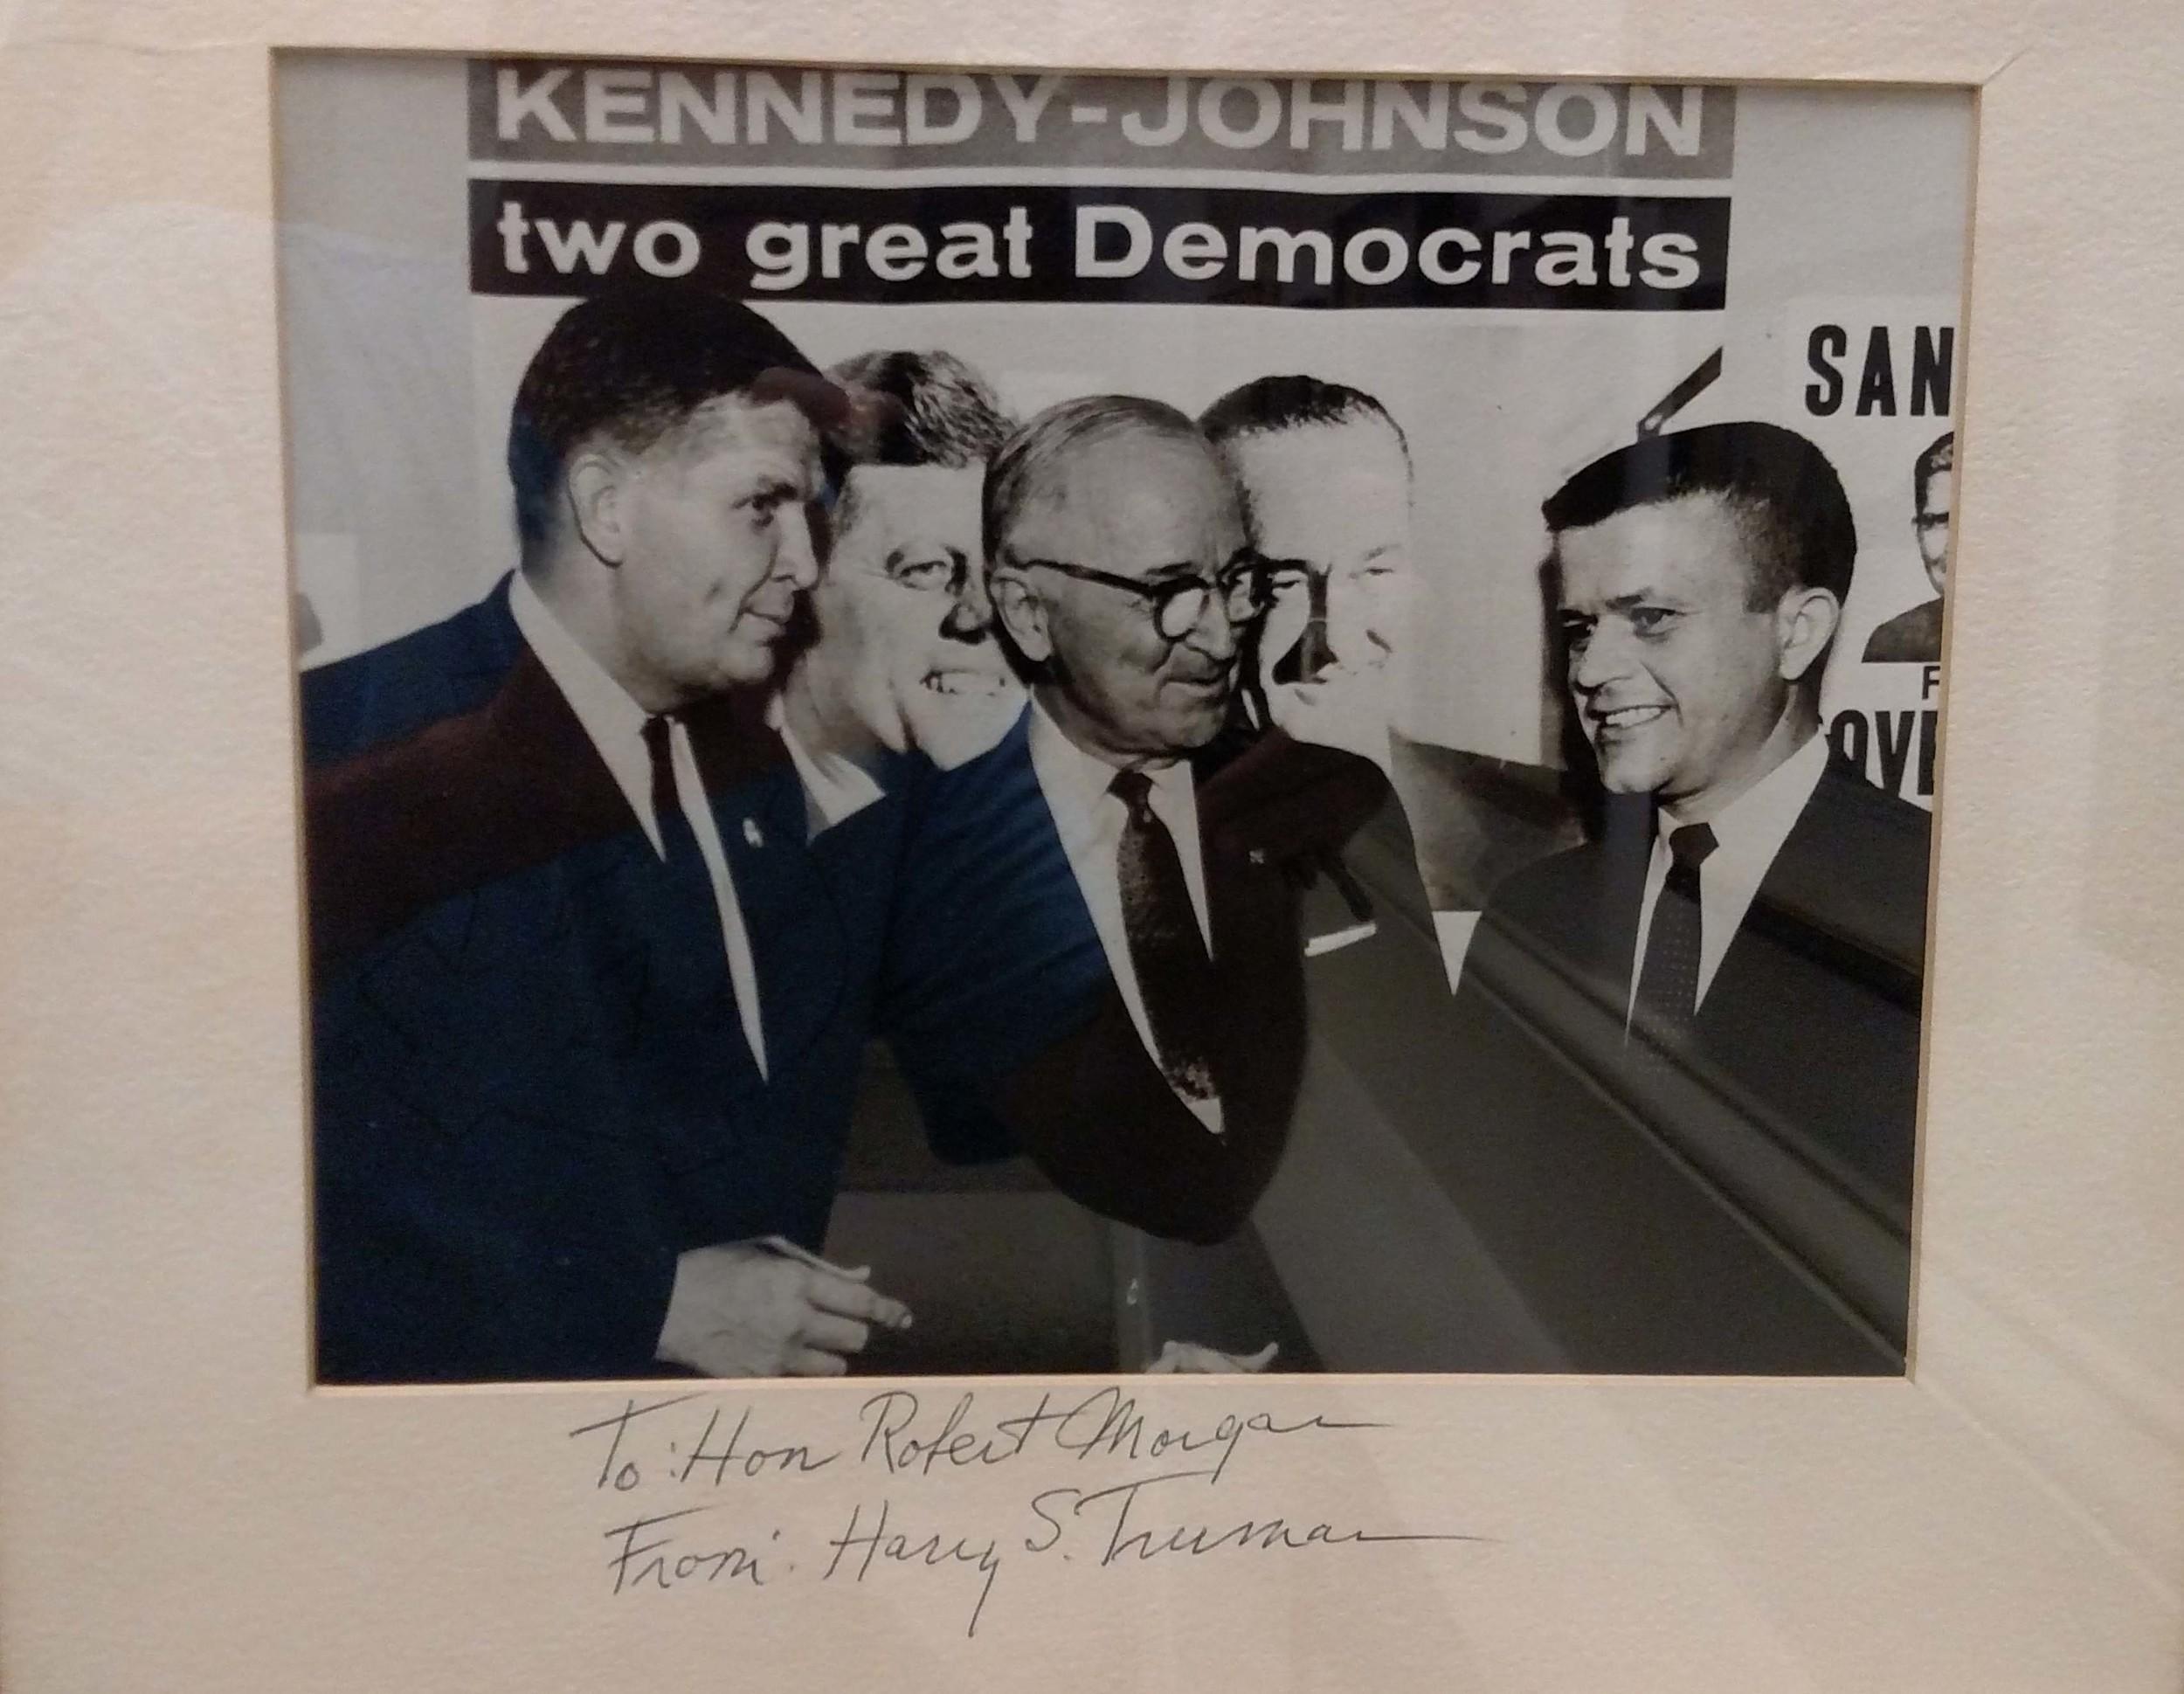 North Carolina Governor Terry Sanford, President Harry Truman and Robert Morgan